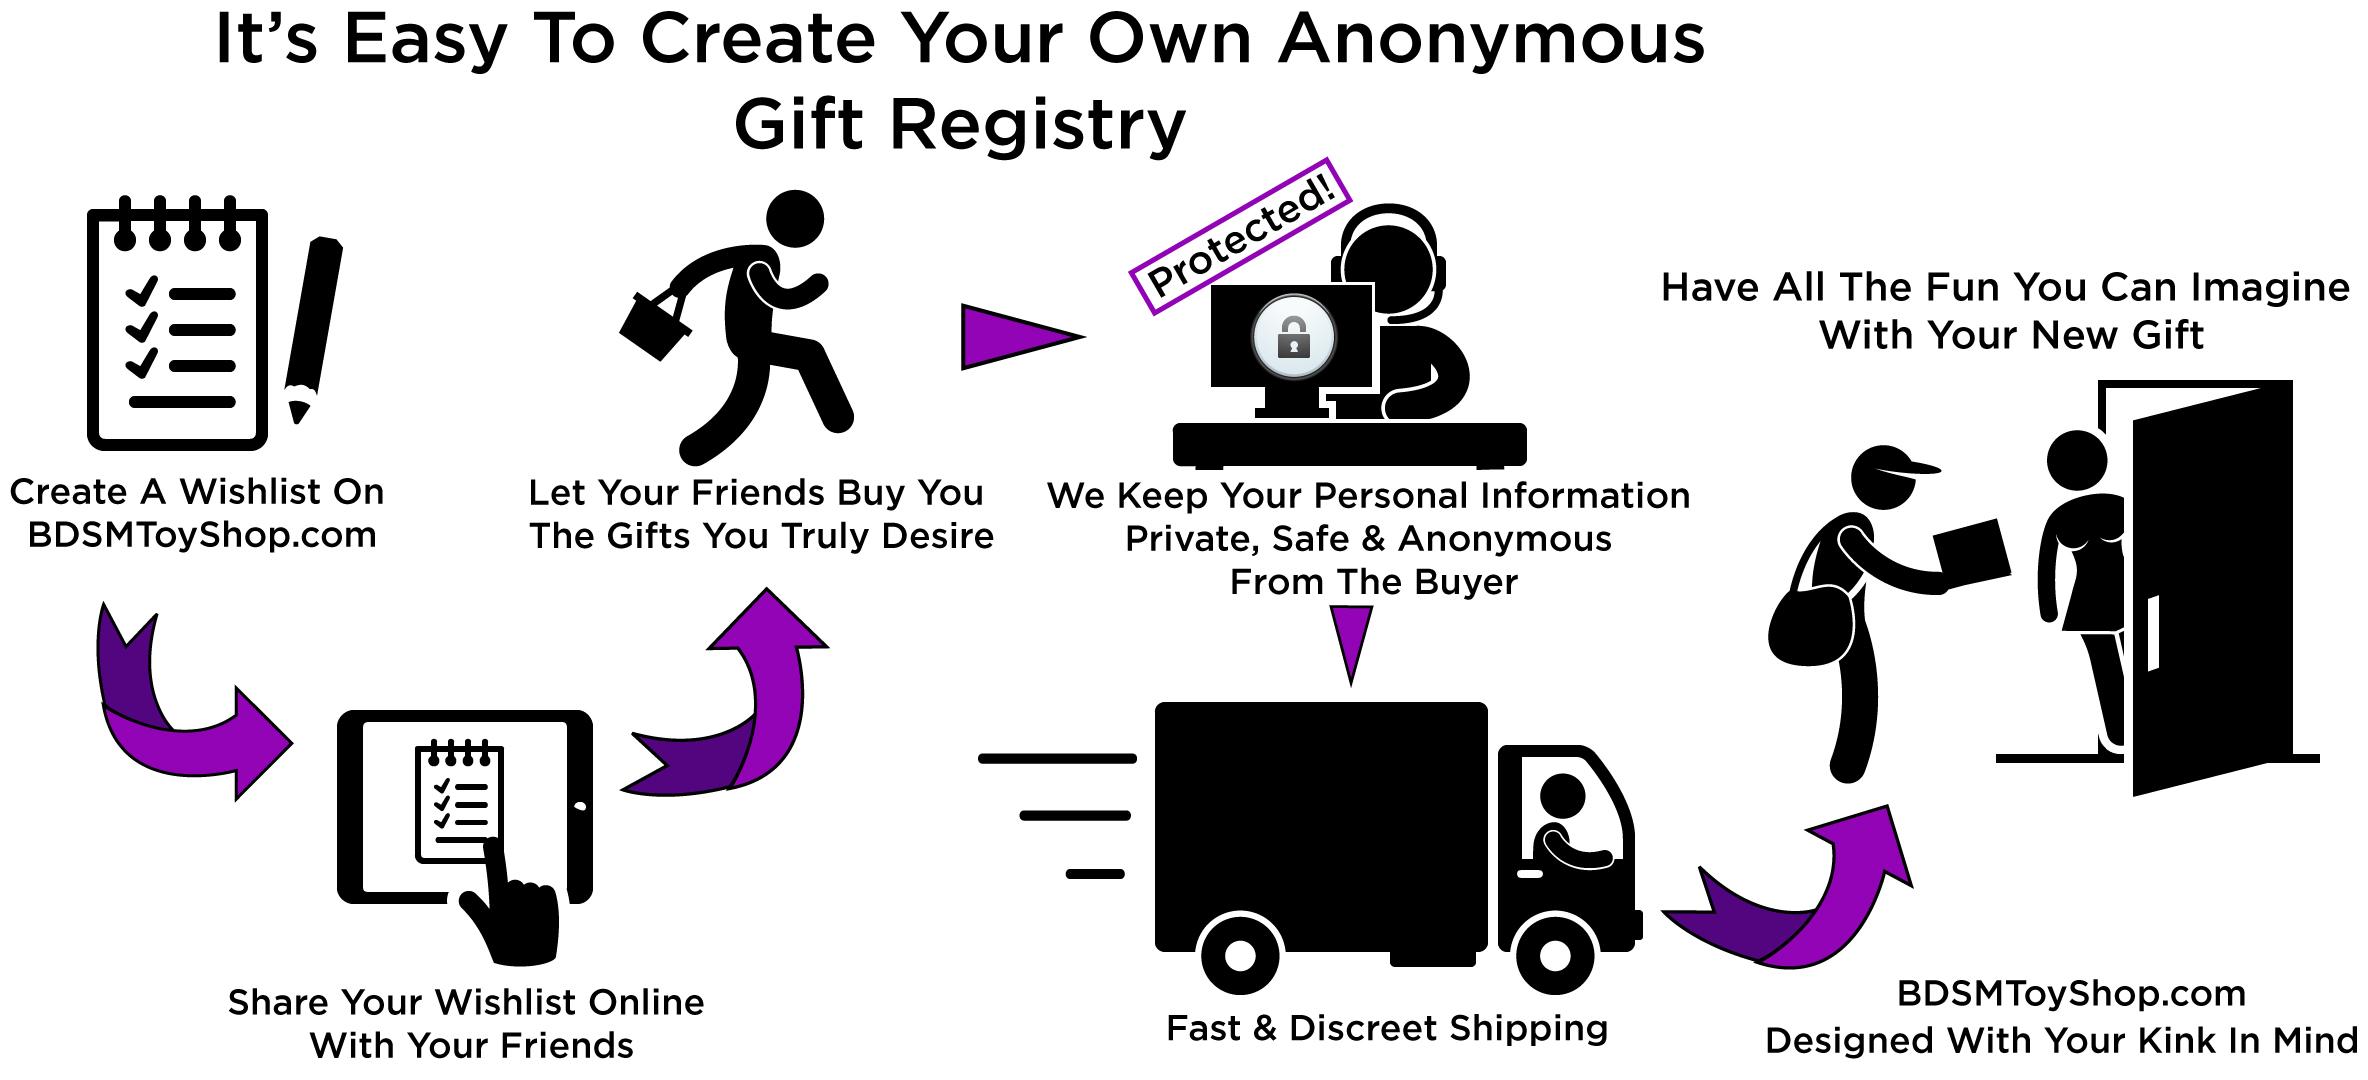 bdsm gear anonymous gift registry info